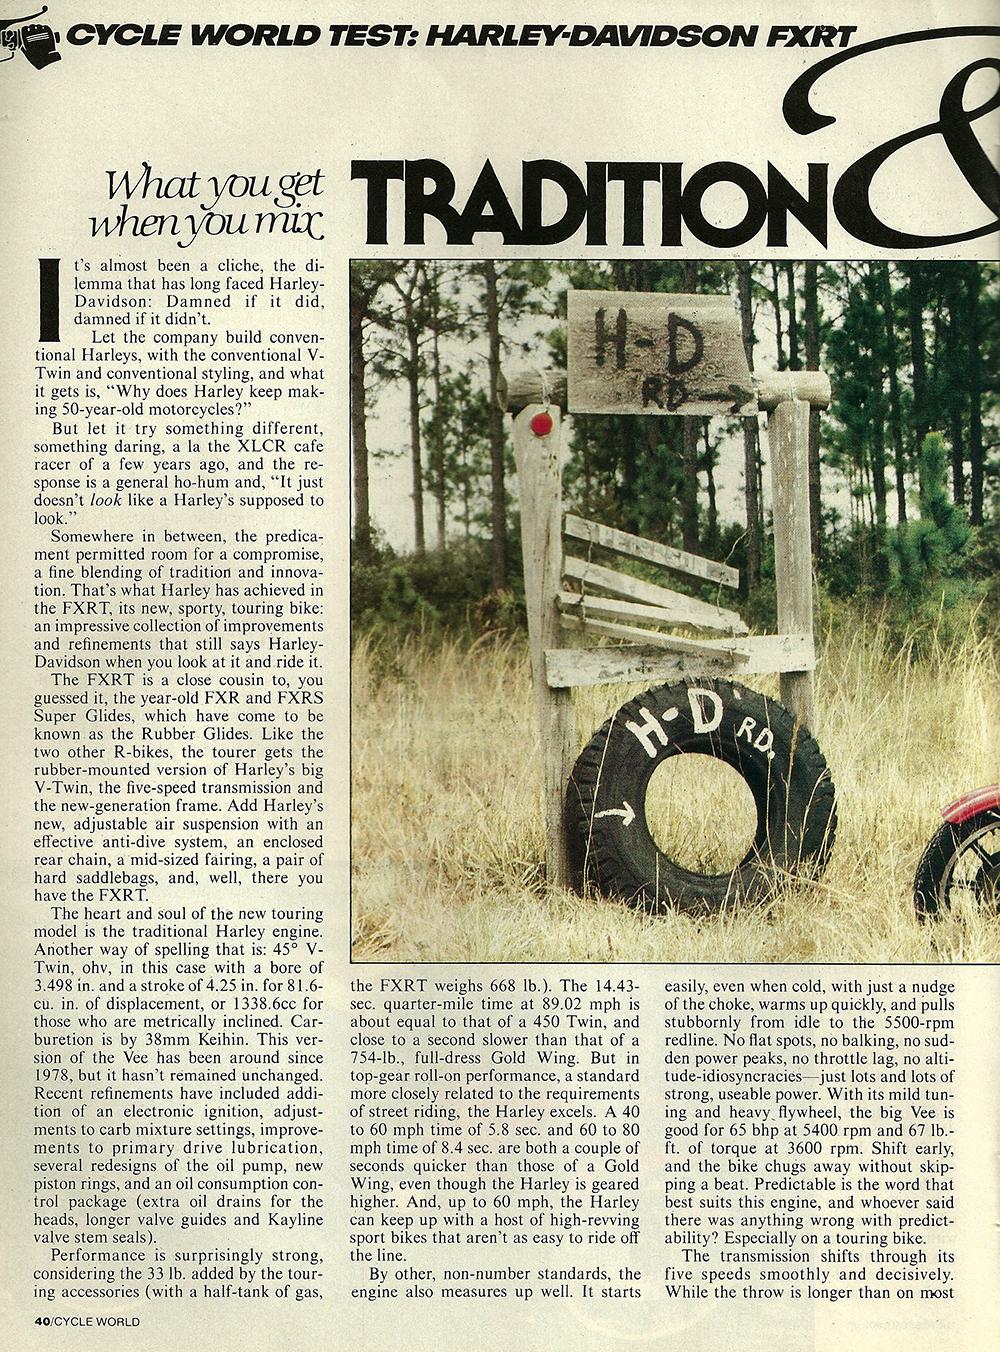 1983 Harley-Davidson FXRT road test 01.jpg